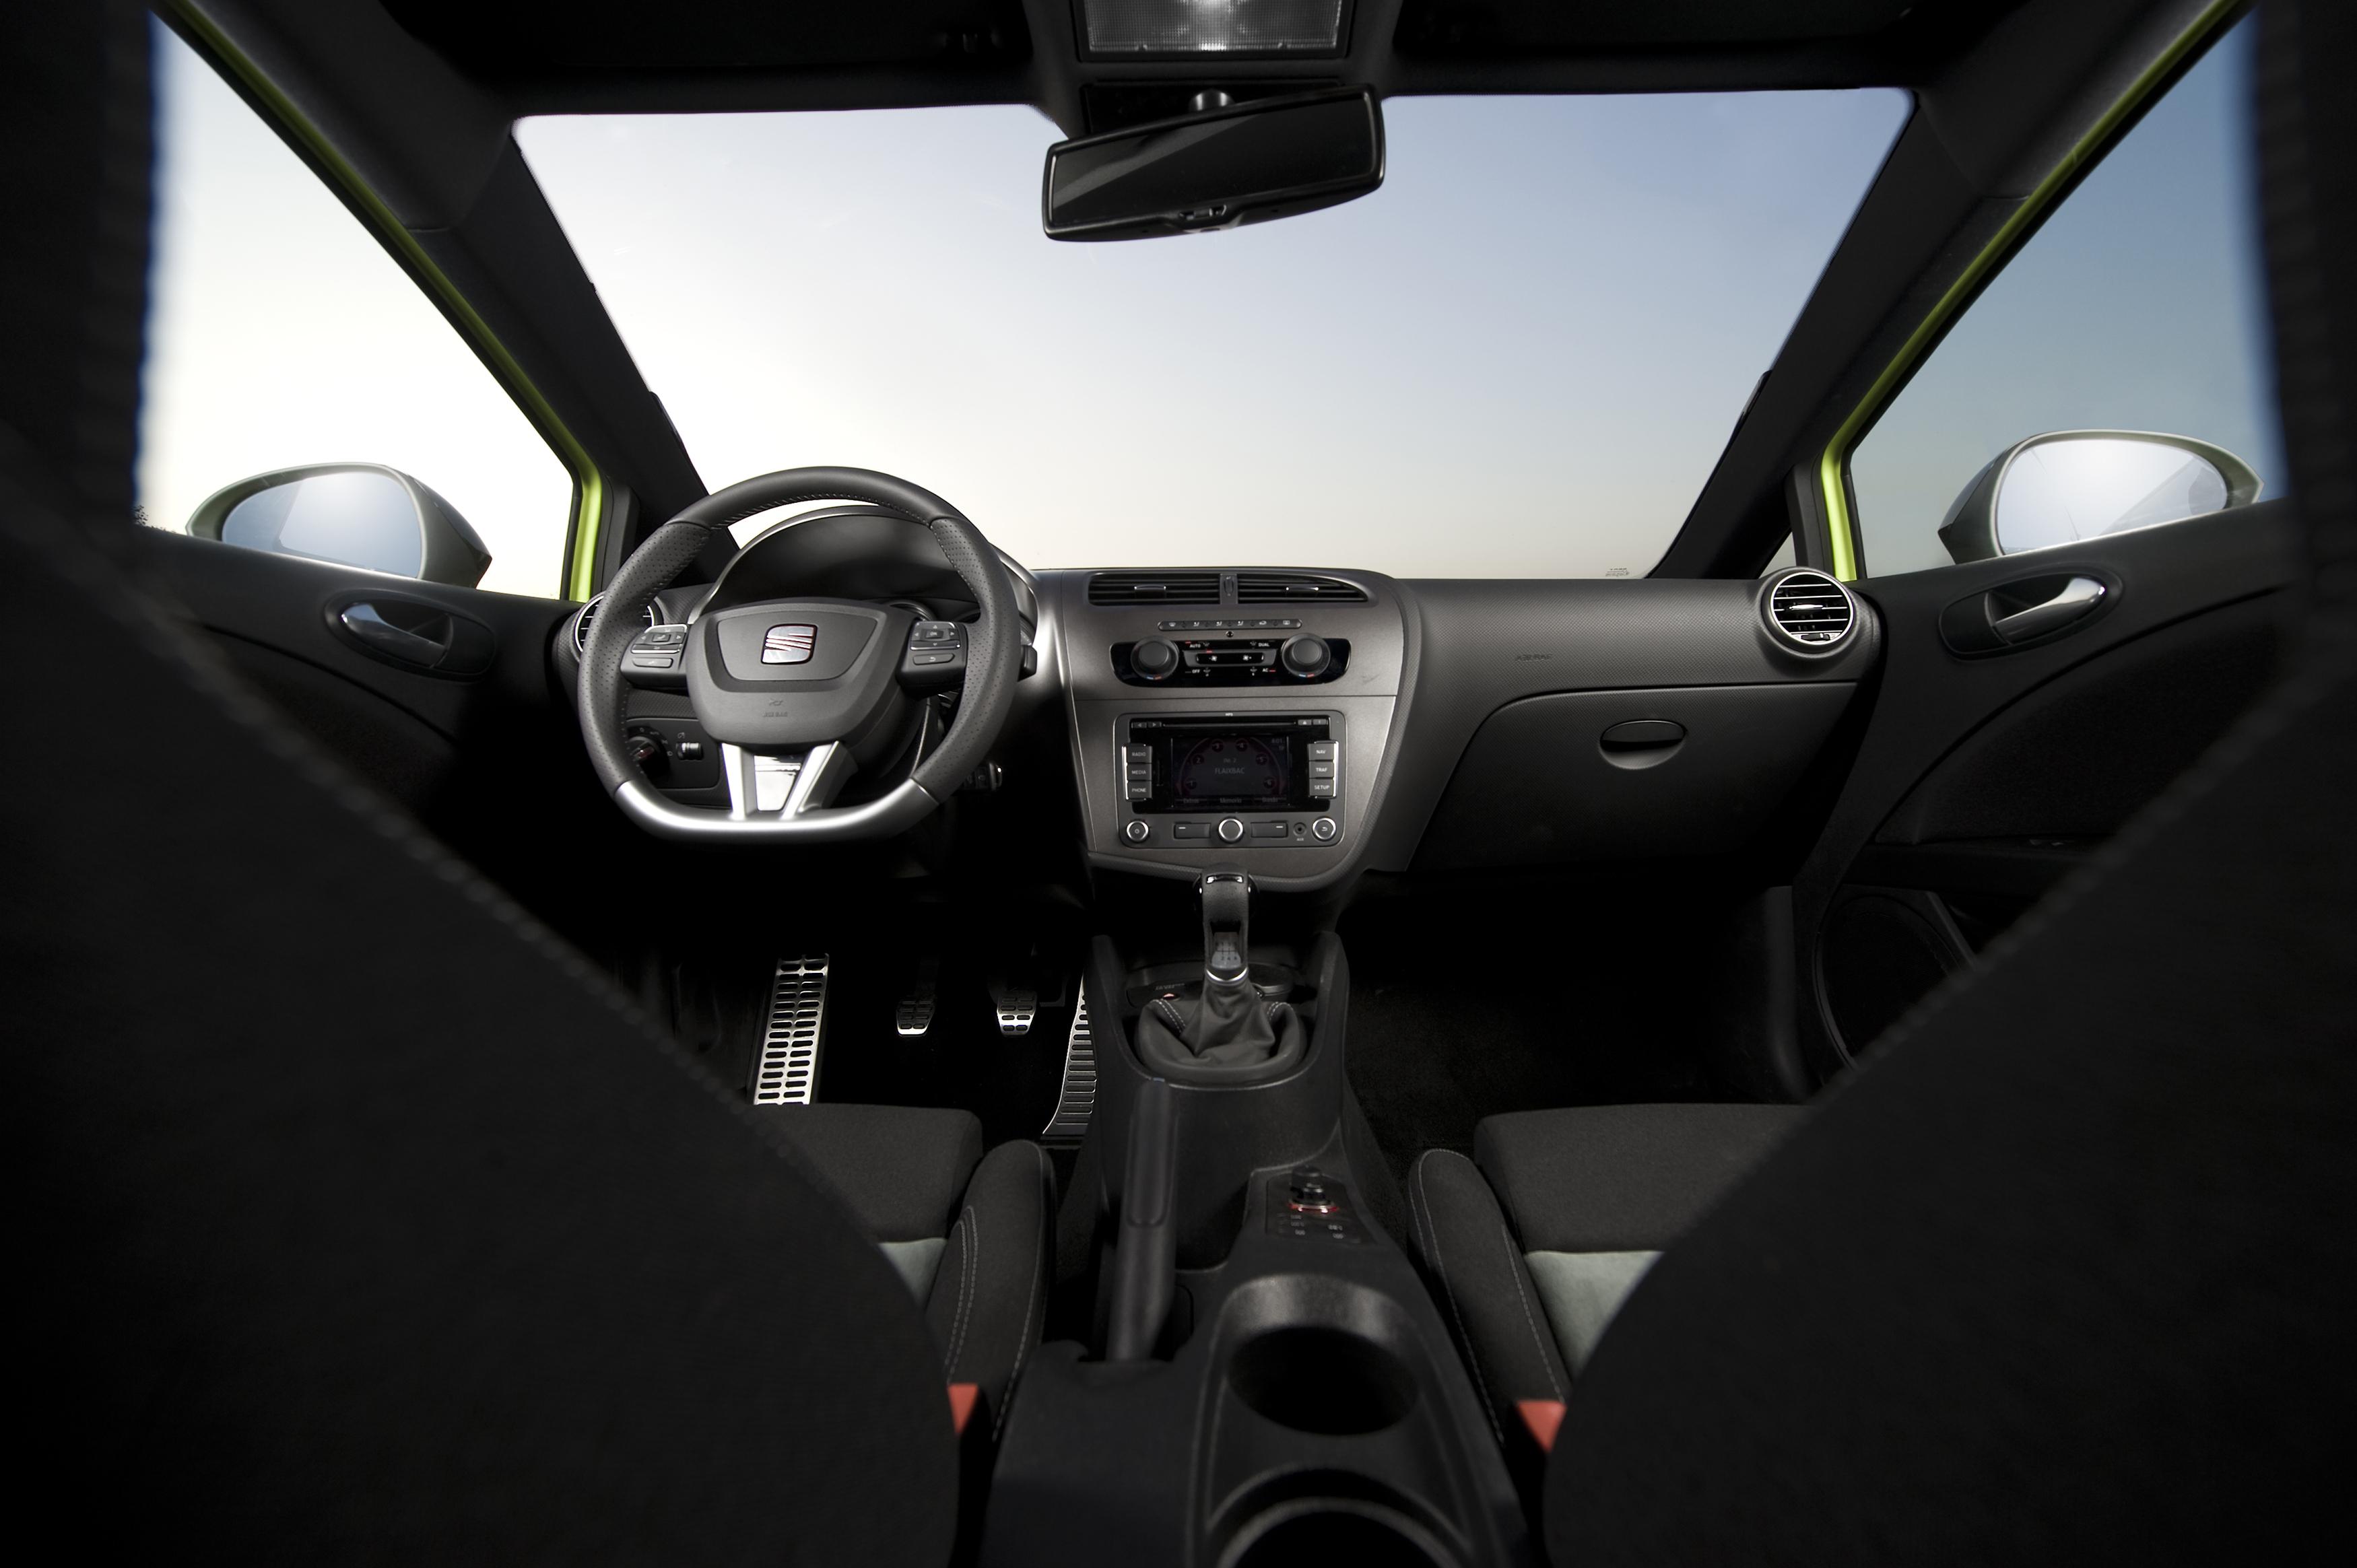 Seat le n cupra r spanish for we wannadrive wannadrive for Seat ibiza cupra interior